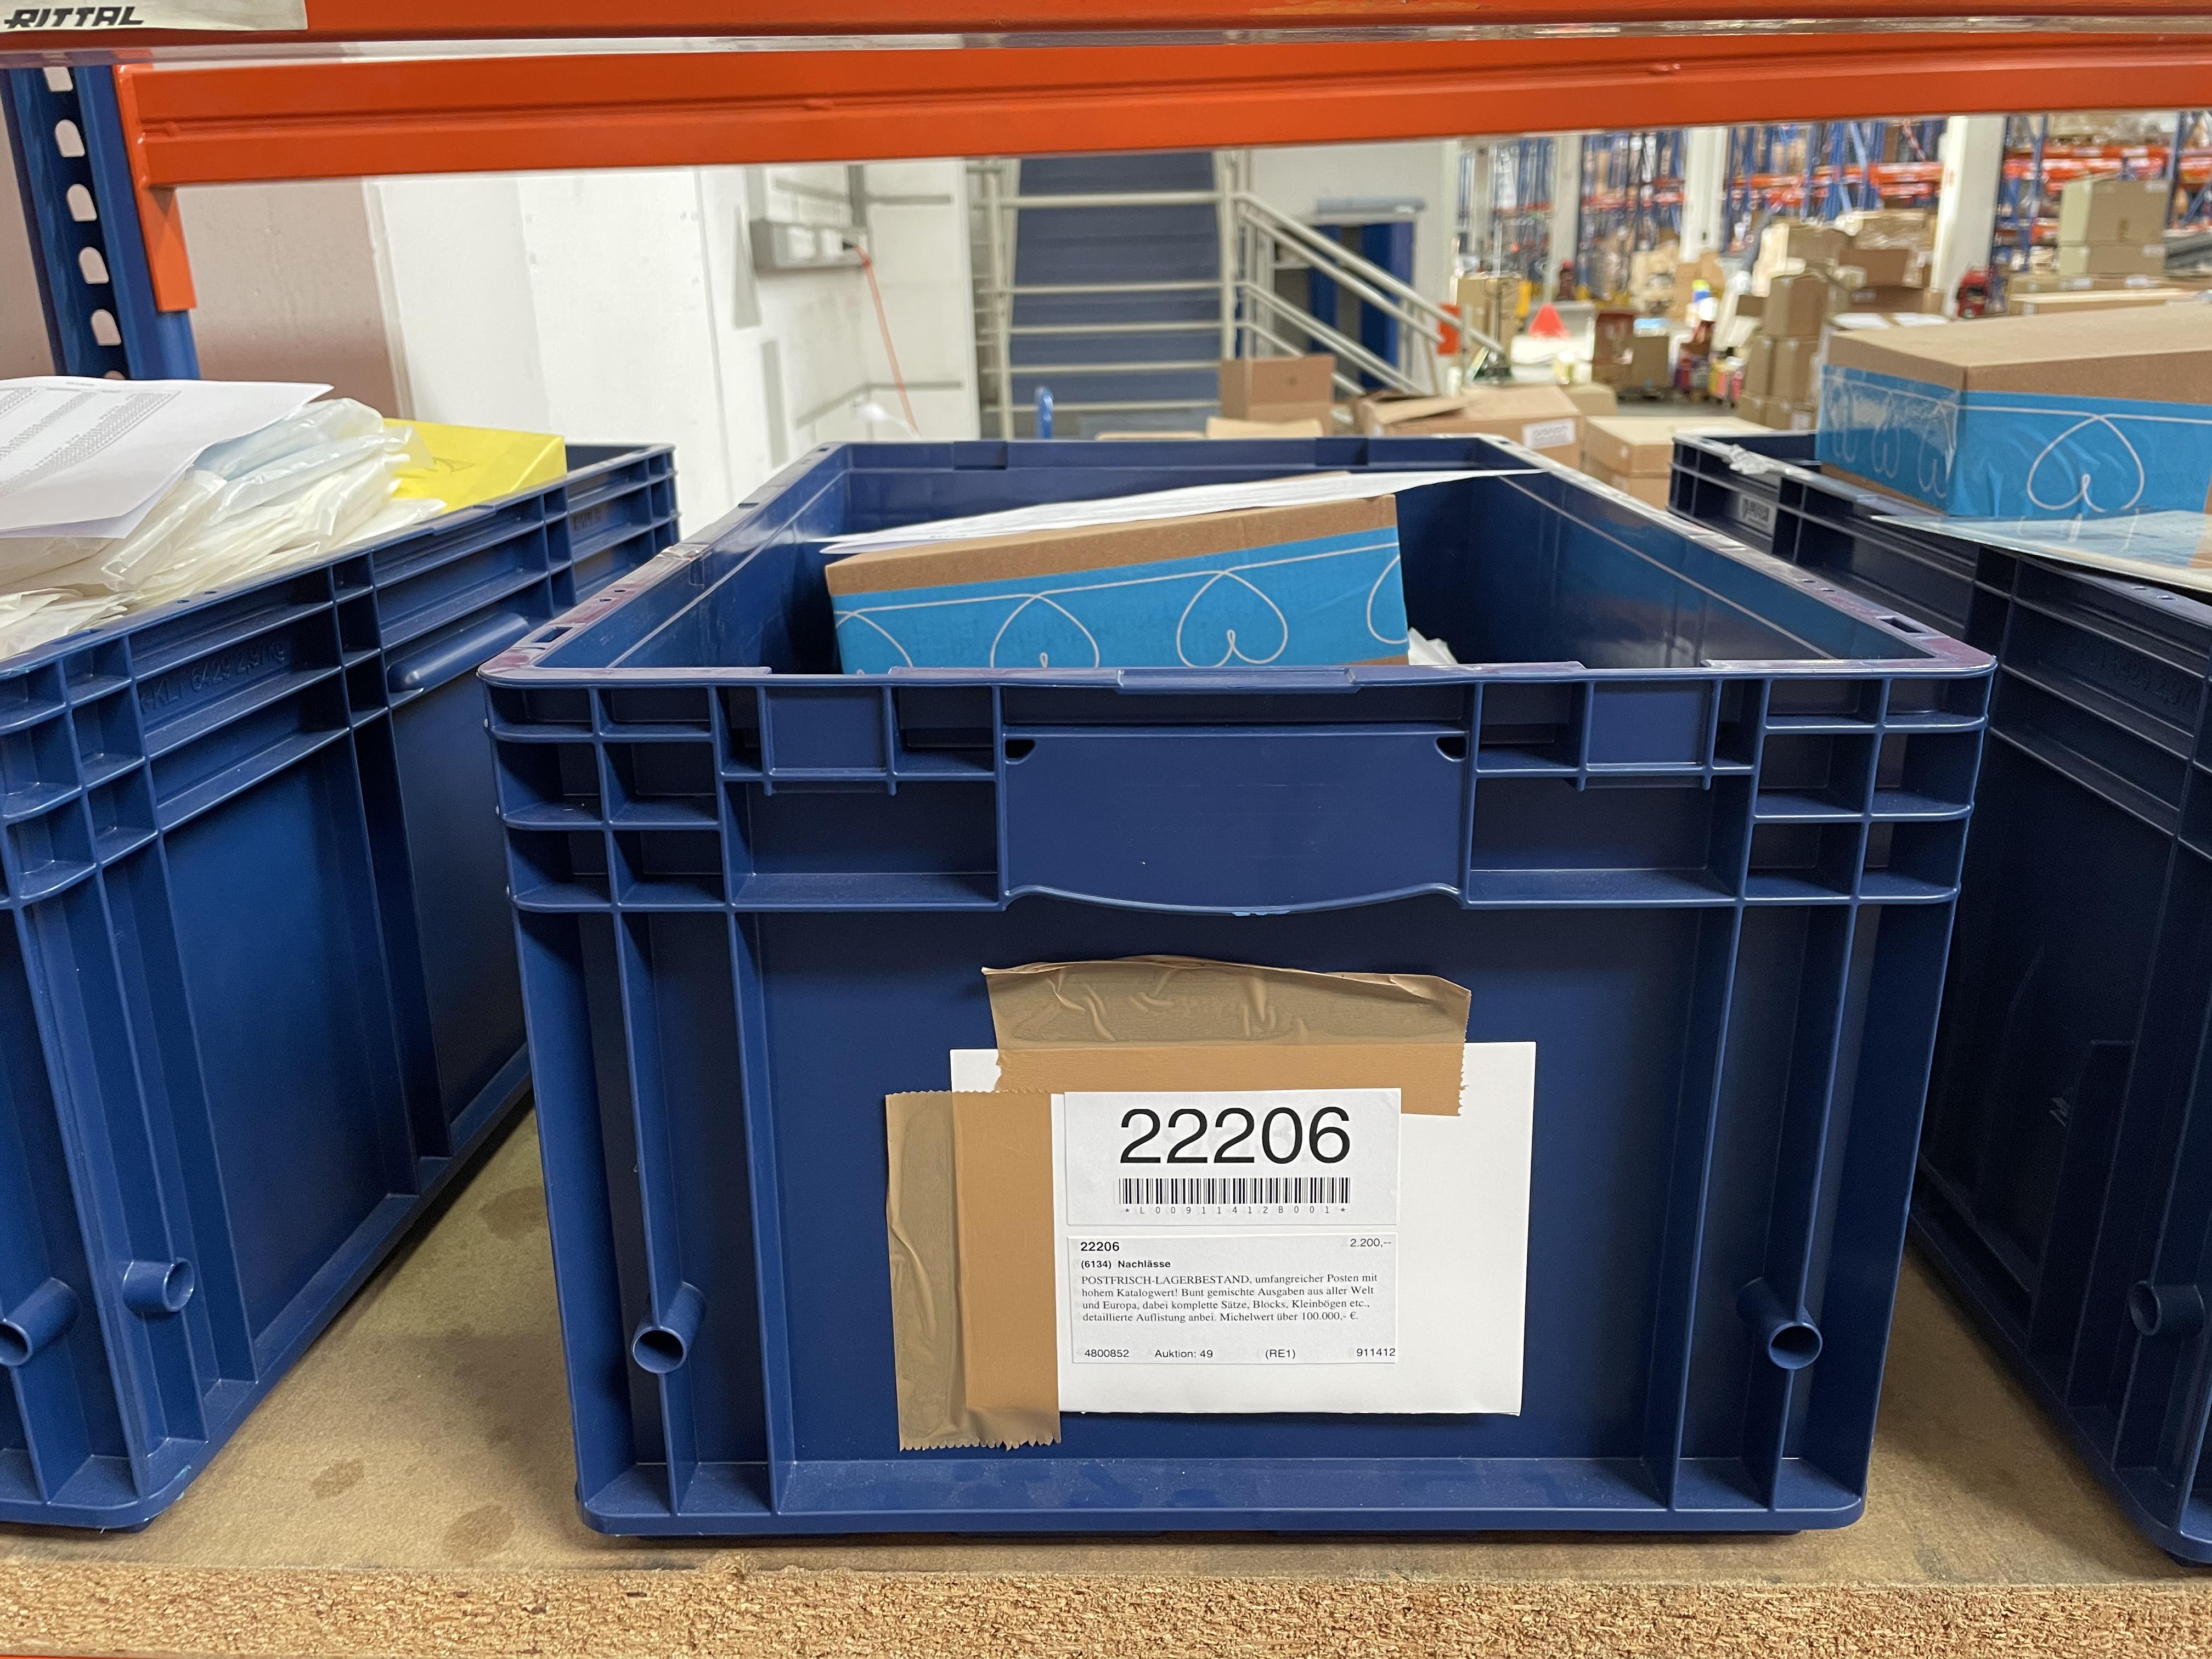 Lot 22206 - nachlässe  -  Auktionshaus Christoph Gärtner GmbH & Co. KG Sale #49 Collections Overseas, Thematics, Europe, Germany/Estates